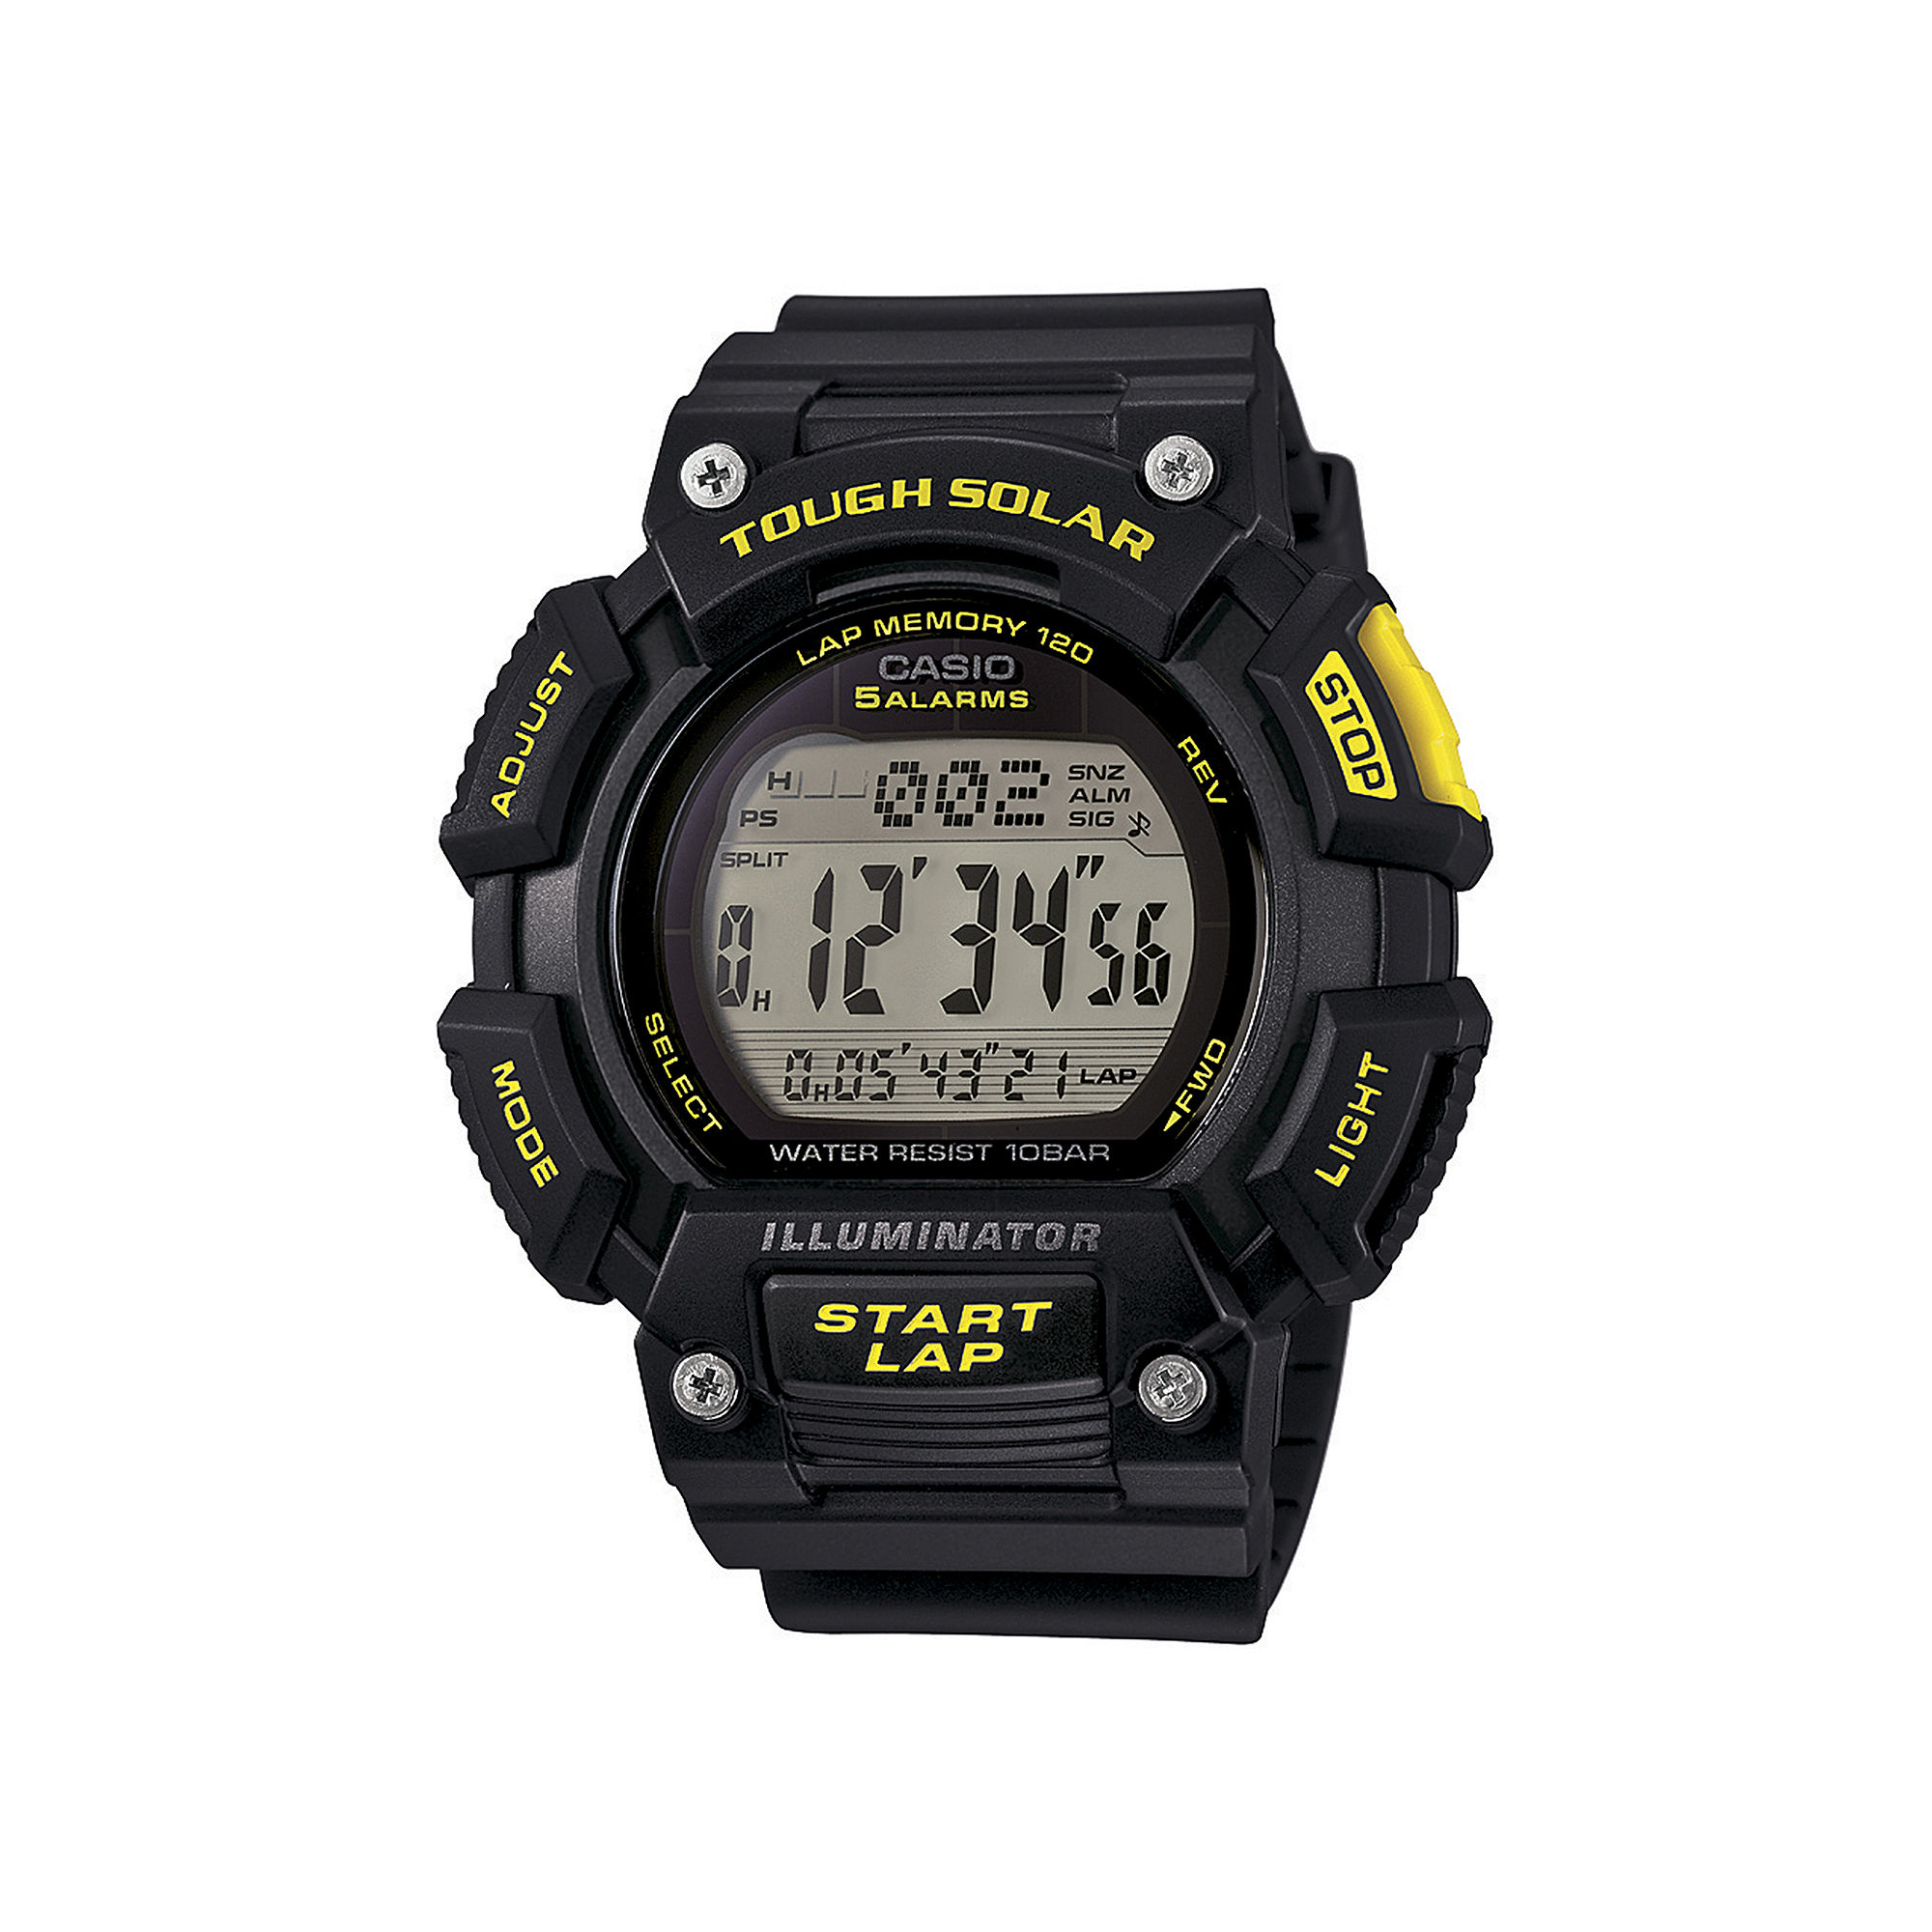 Casio Tough Solar Illuminator Mens Runner Sport Watch STLS110H-1C